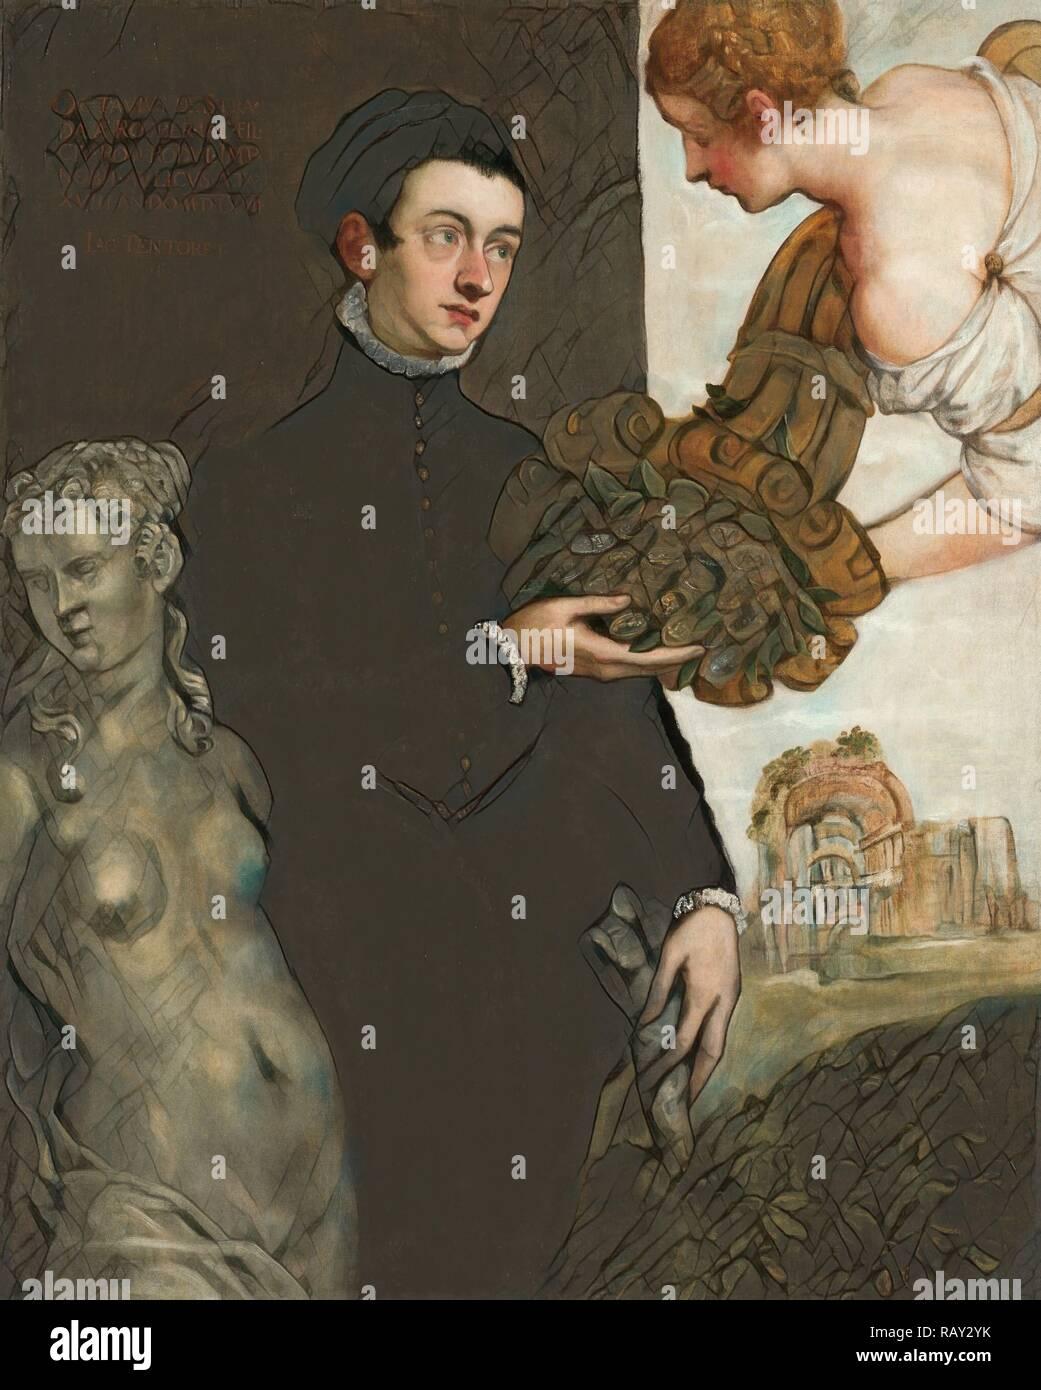 Portrait of Ottavio Strada, Jacopo Tintoretto, 1567. Reimagined by Gibon. Classic art with a modern twist reimagined Stock Photo